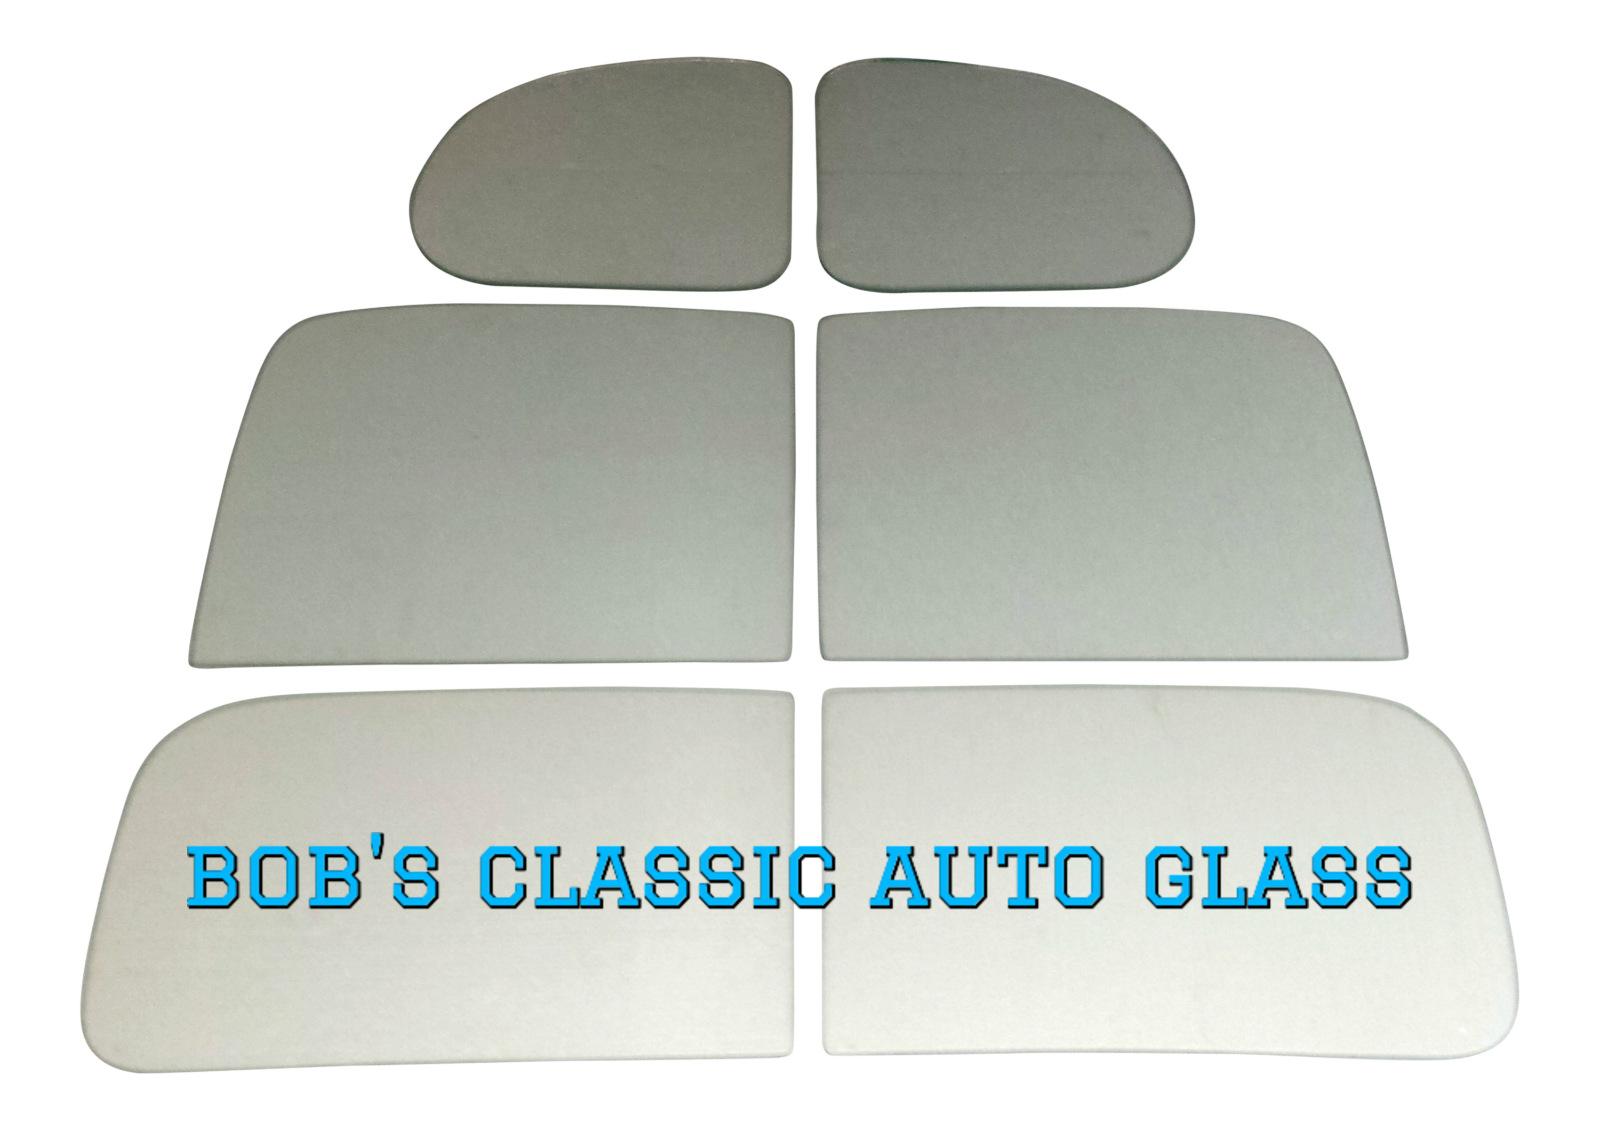 1949 1950 1951 NASH 4 DOOR SEDAN CLASSIC AUTO GLAS